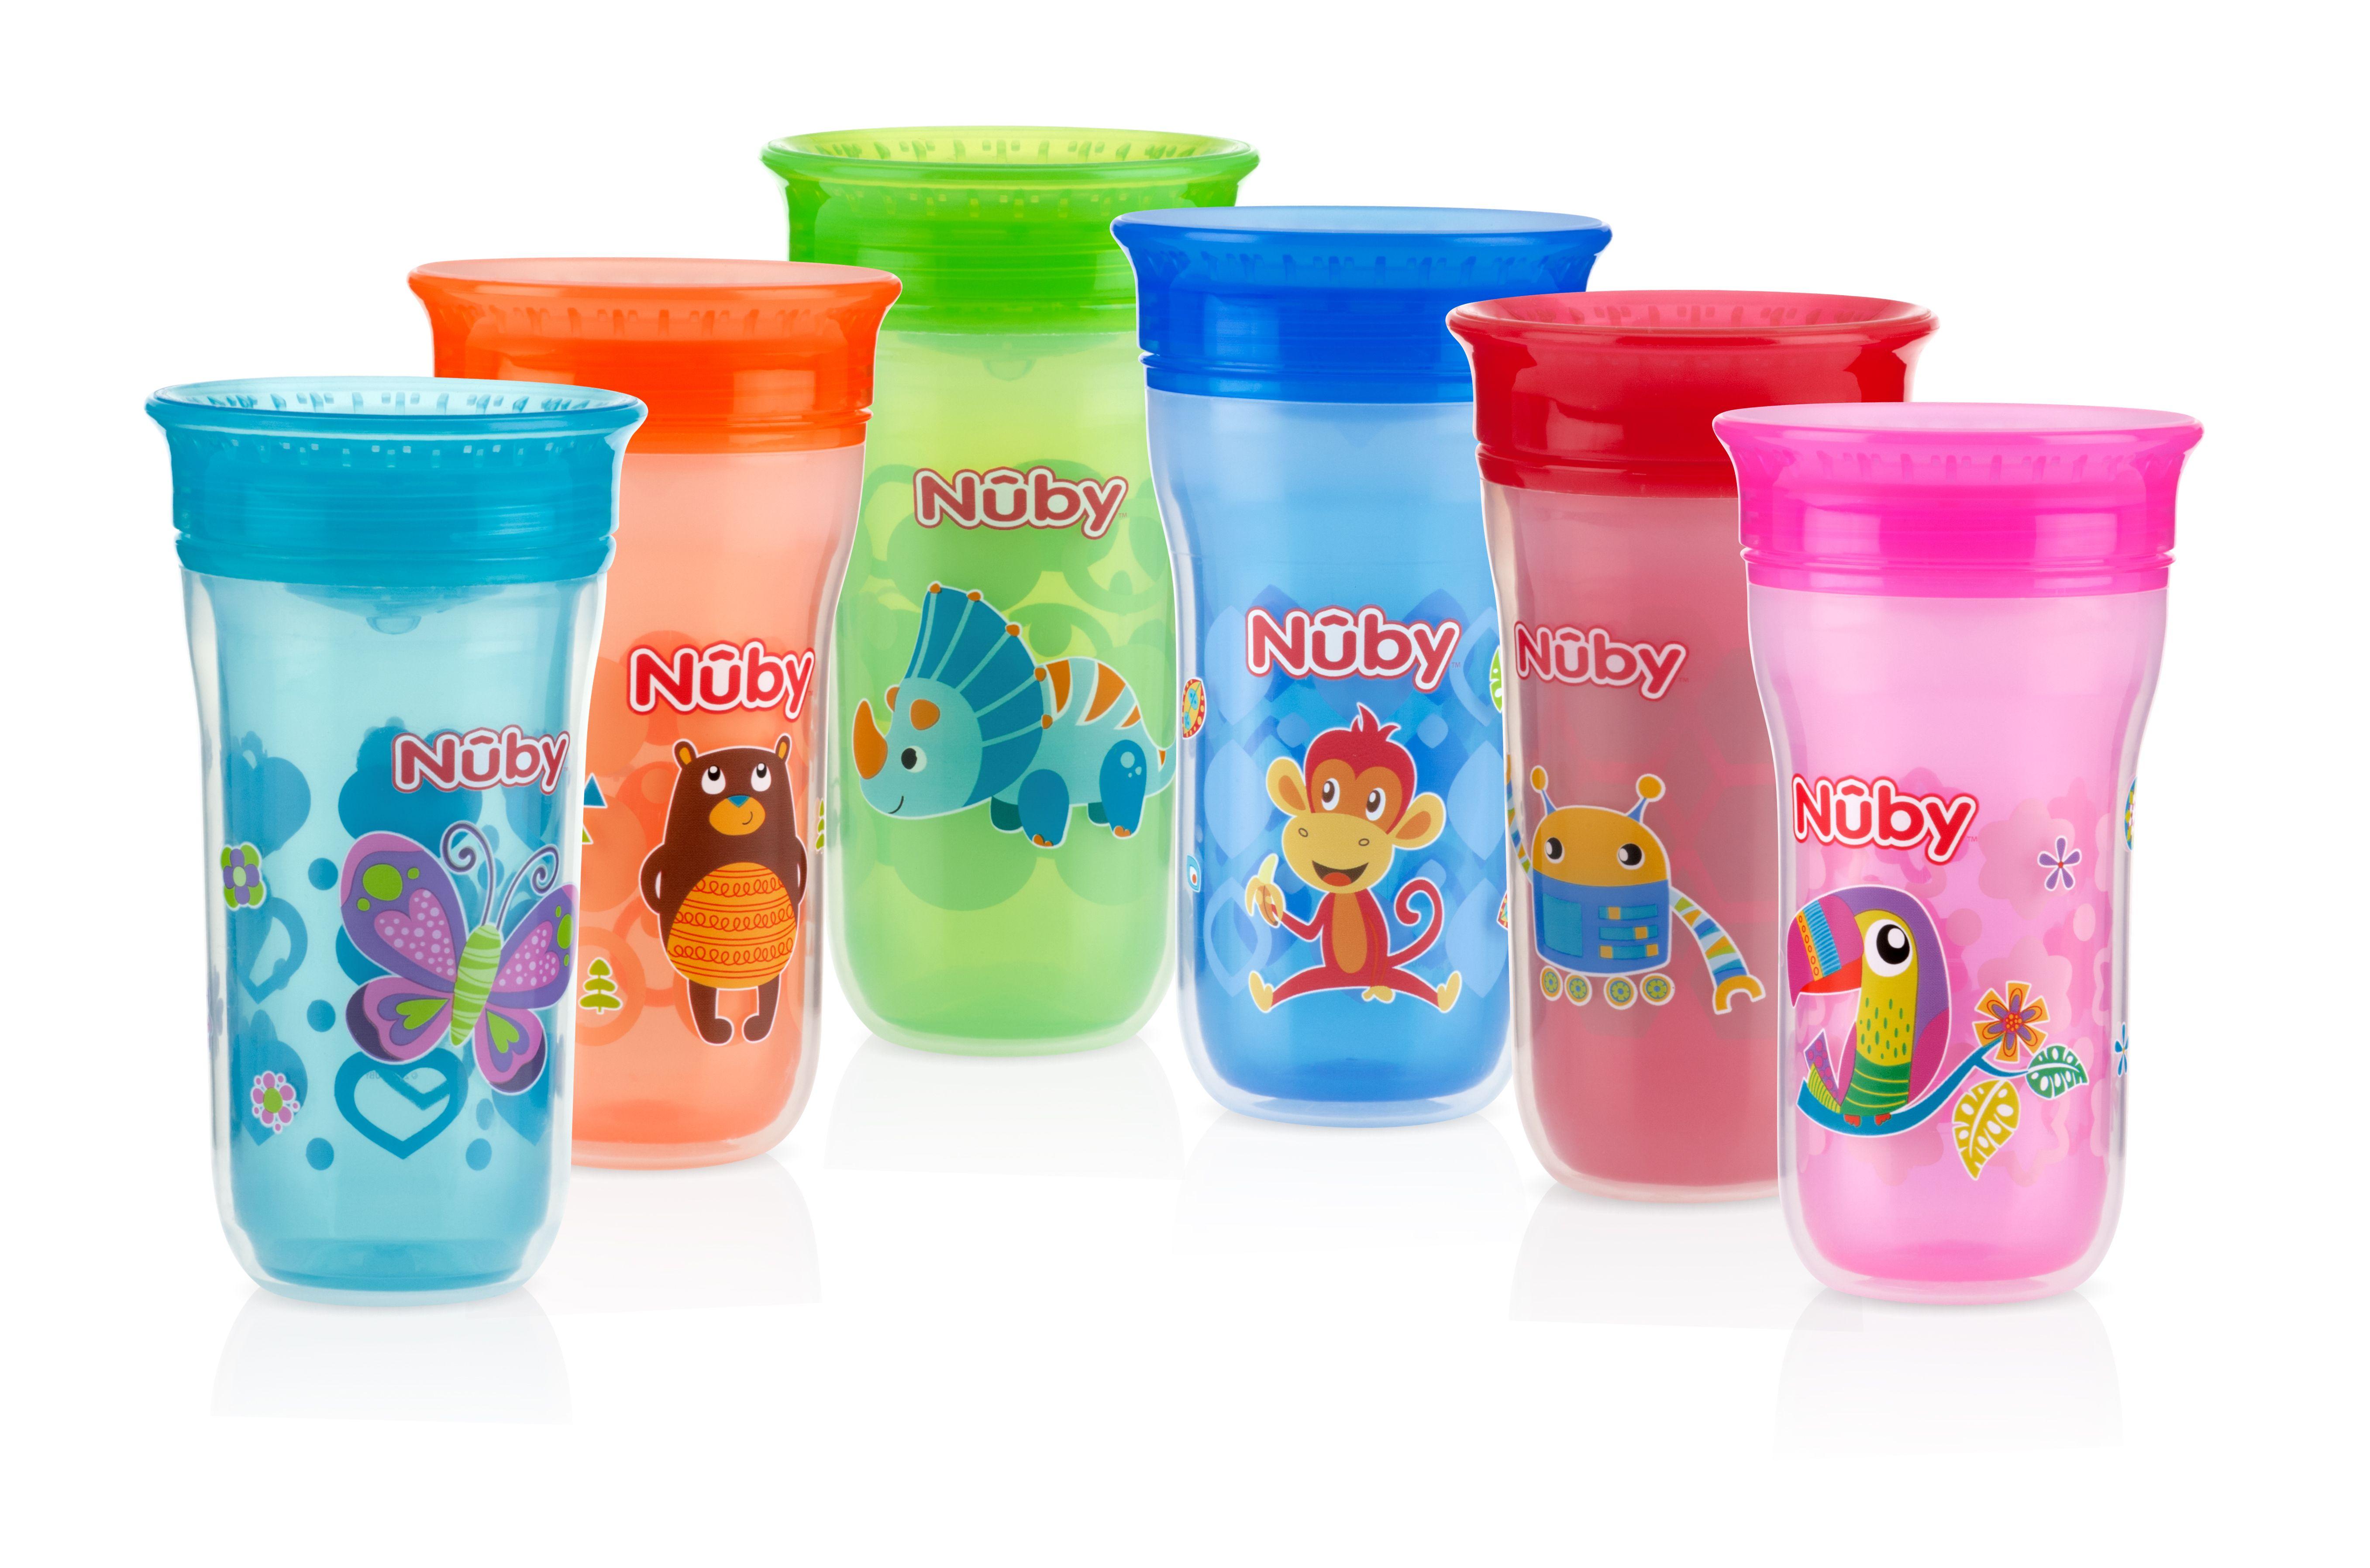 Nuby Wonder Cup Feeding Baby Food Spills Insulated